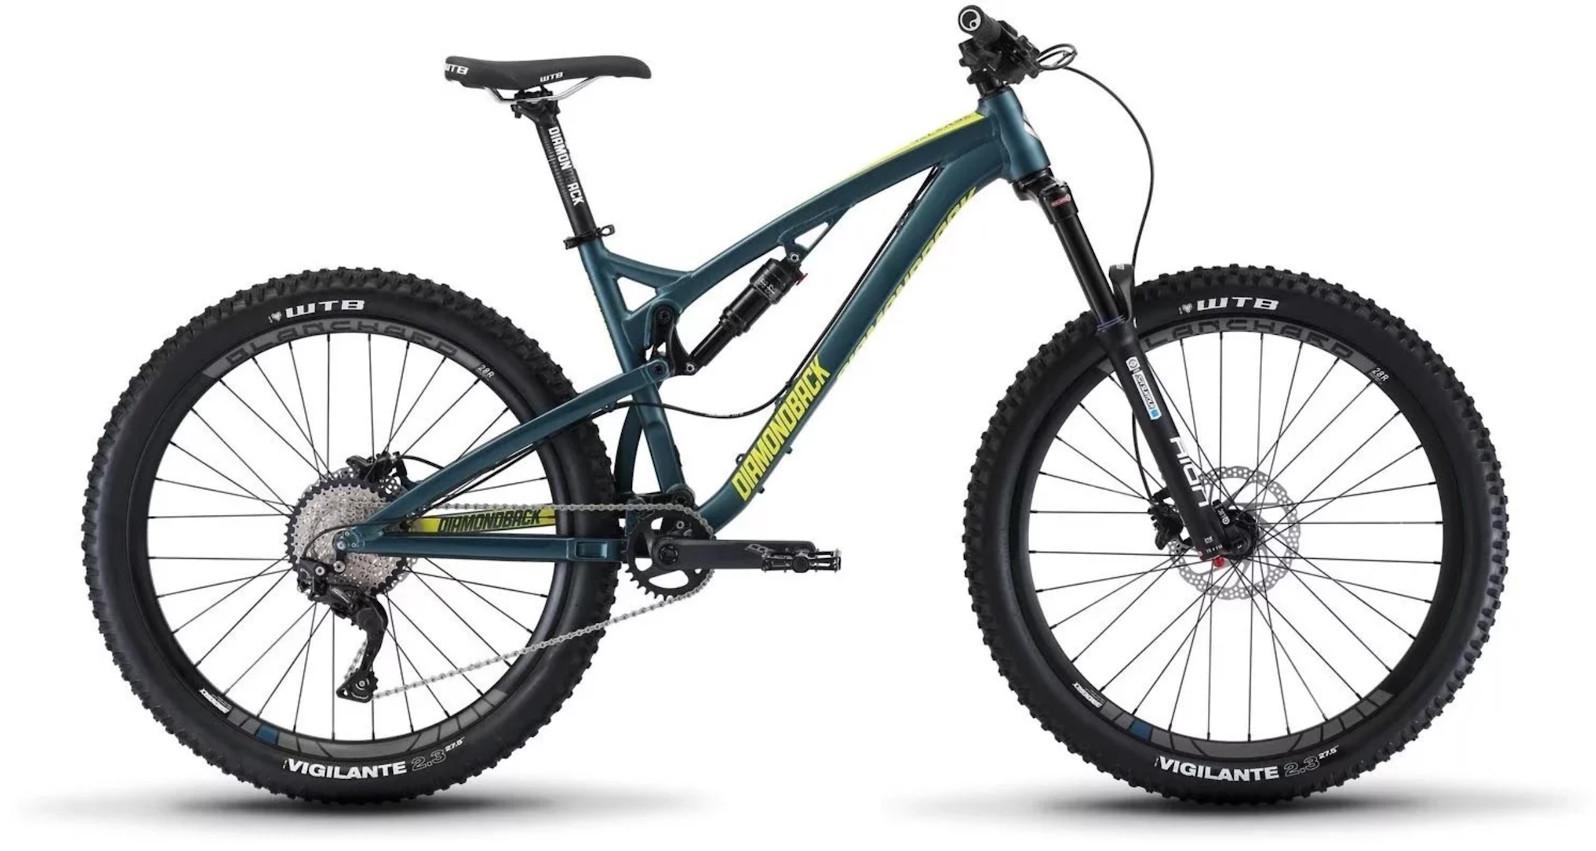 2019 Diamondback Release 1 Bike - Reviews, Comparisons